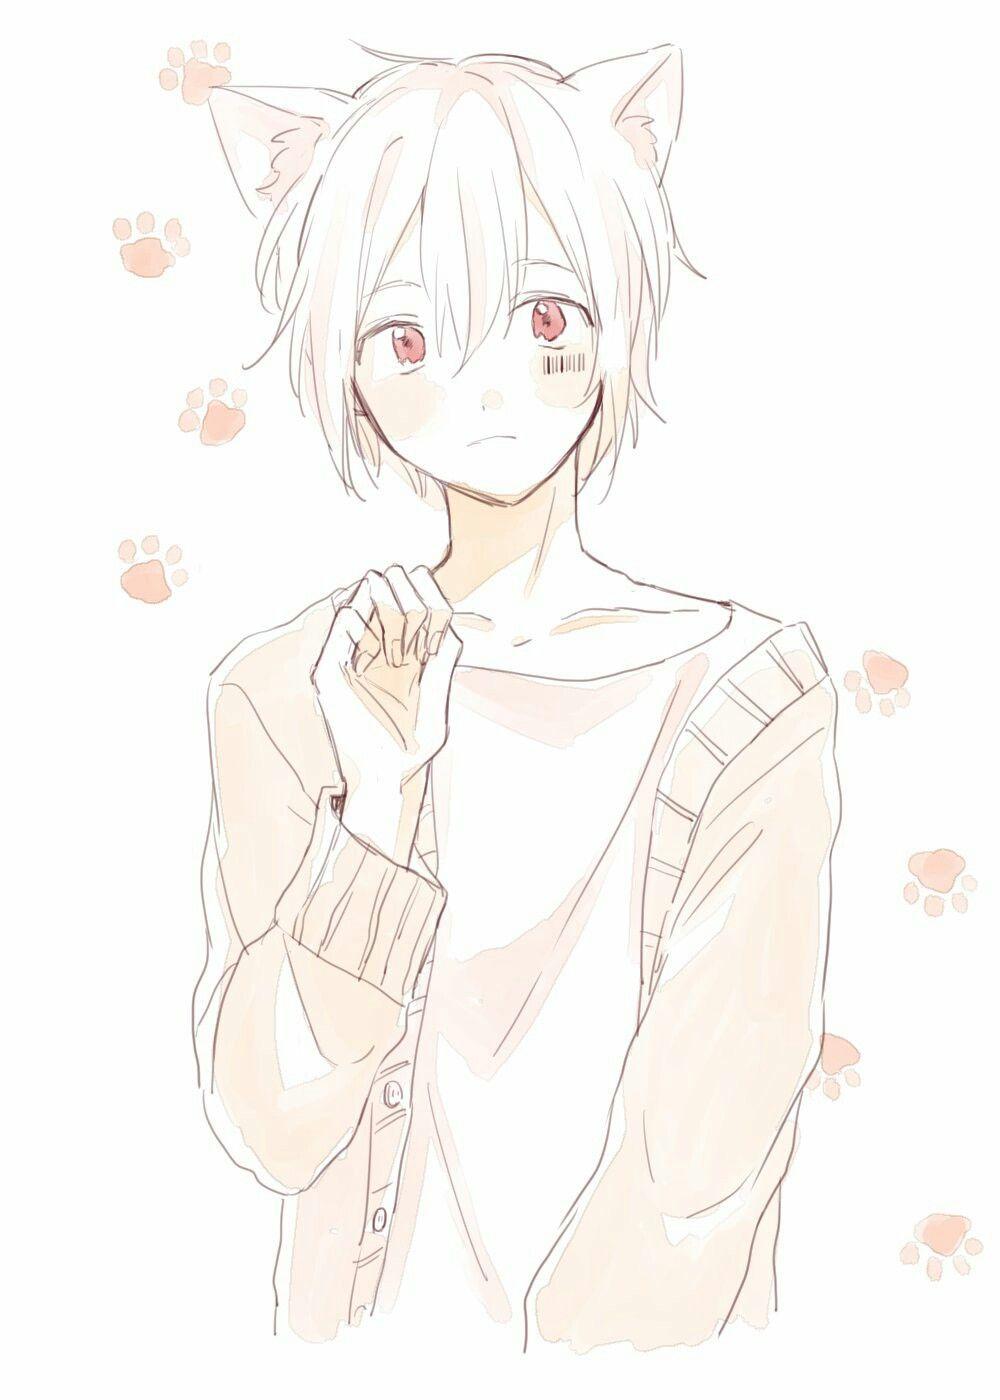 Little Shy Jamie Anime Neko Kawaii Anime Cute Anime Boy